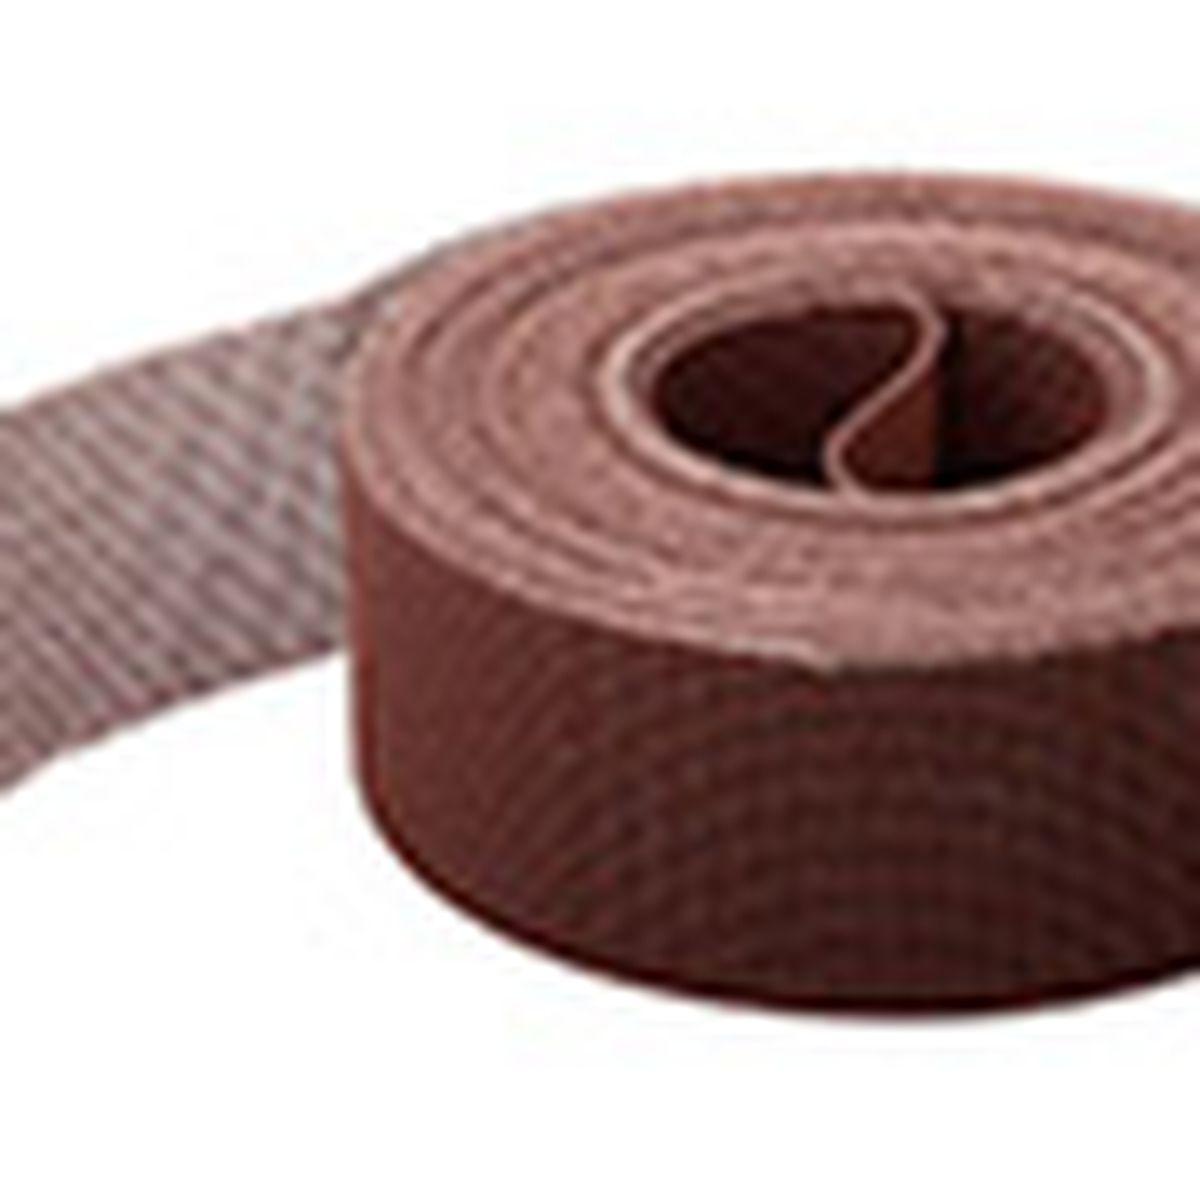 Plumbing sandpaper